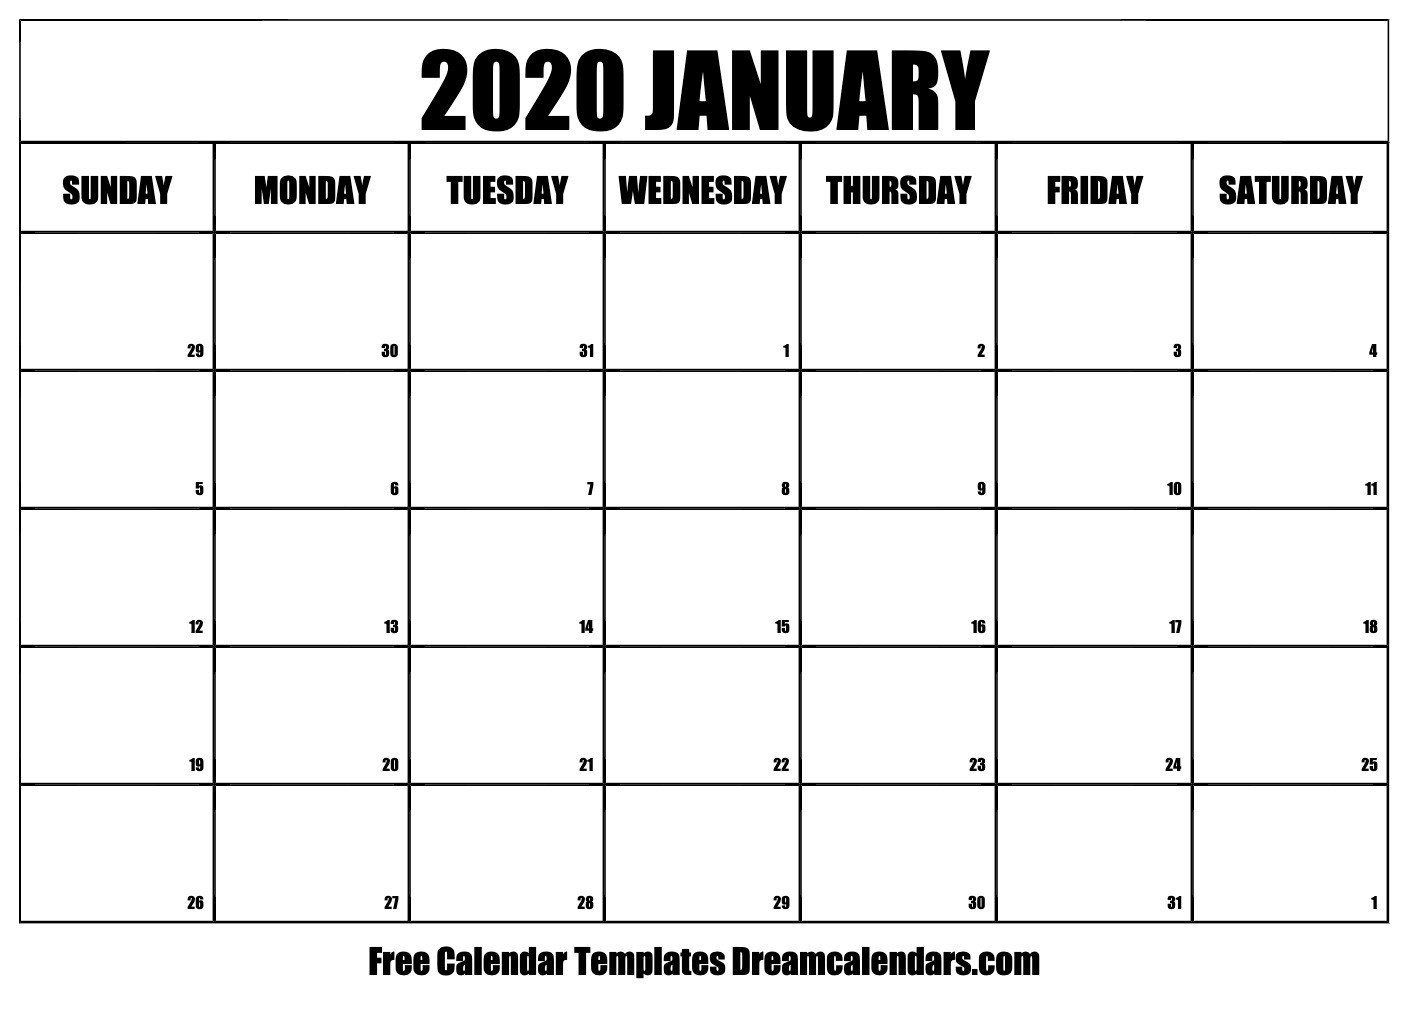 Printable January 2020 Calendar Templates - Helena Orstem